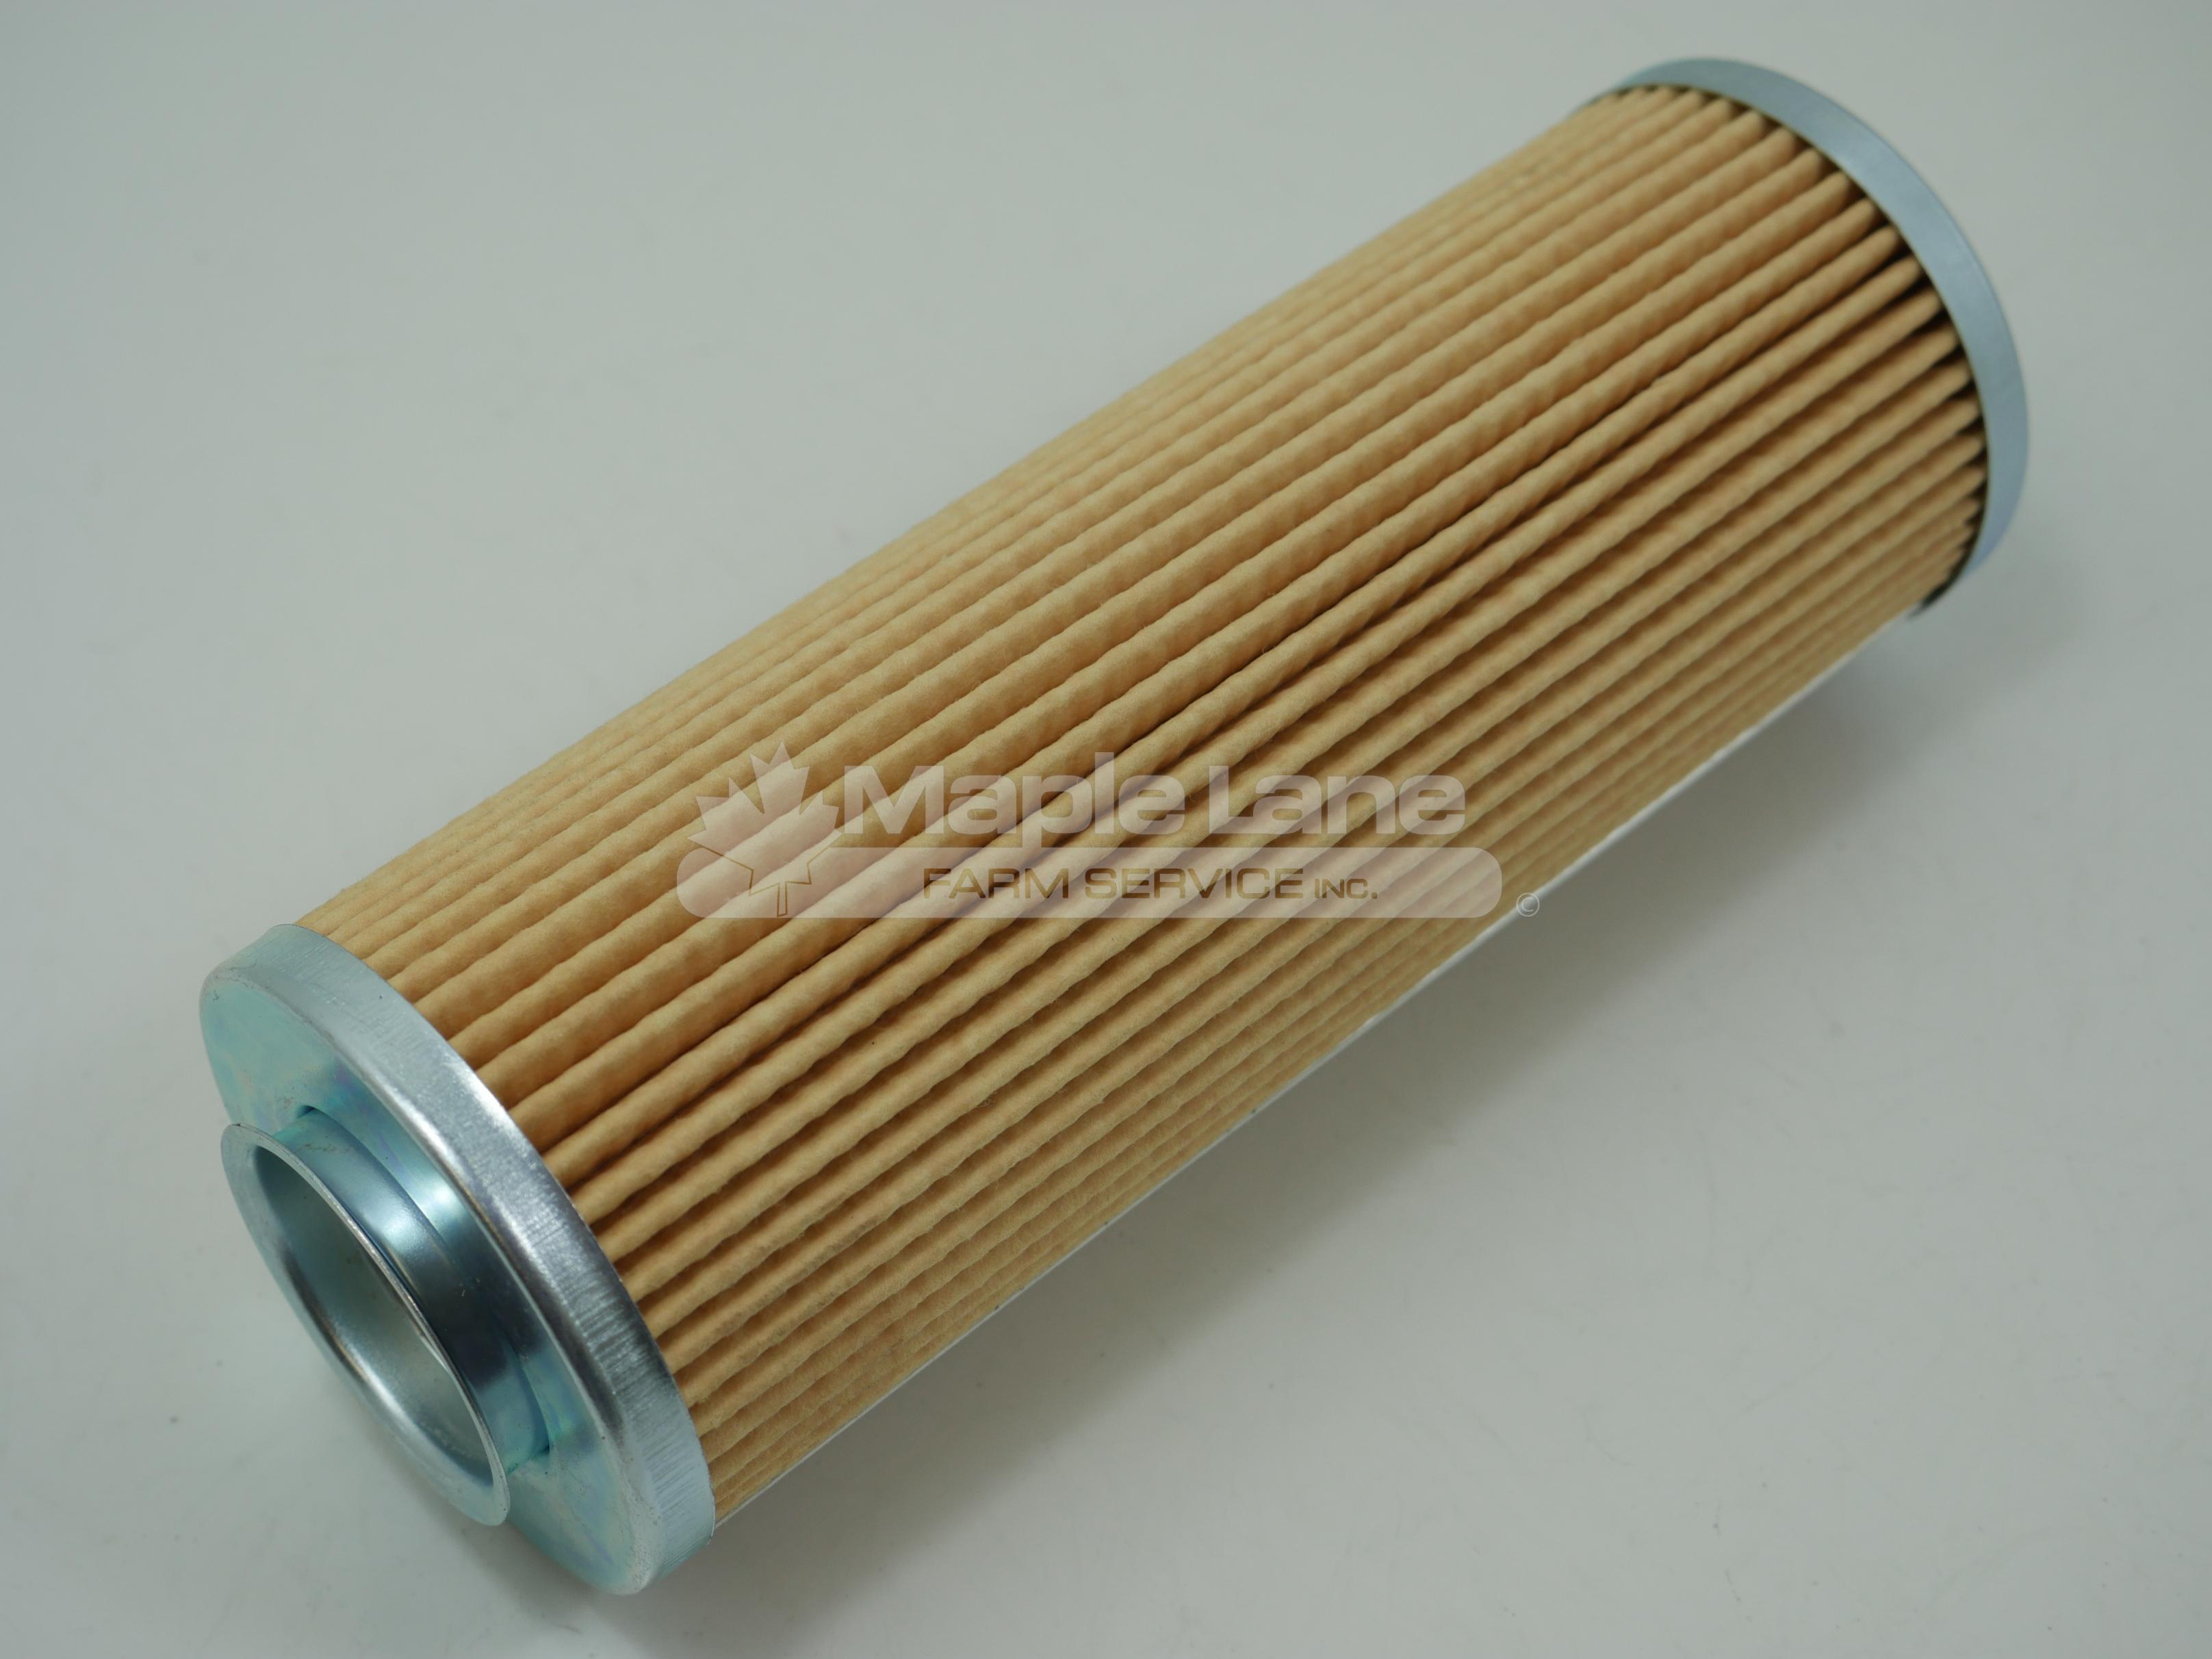 J221174 Hydraulic Filter